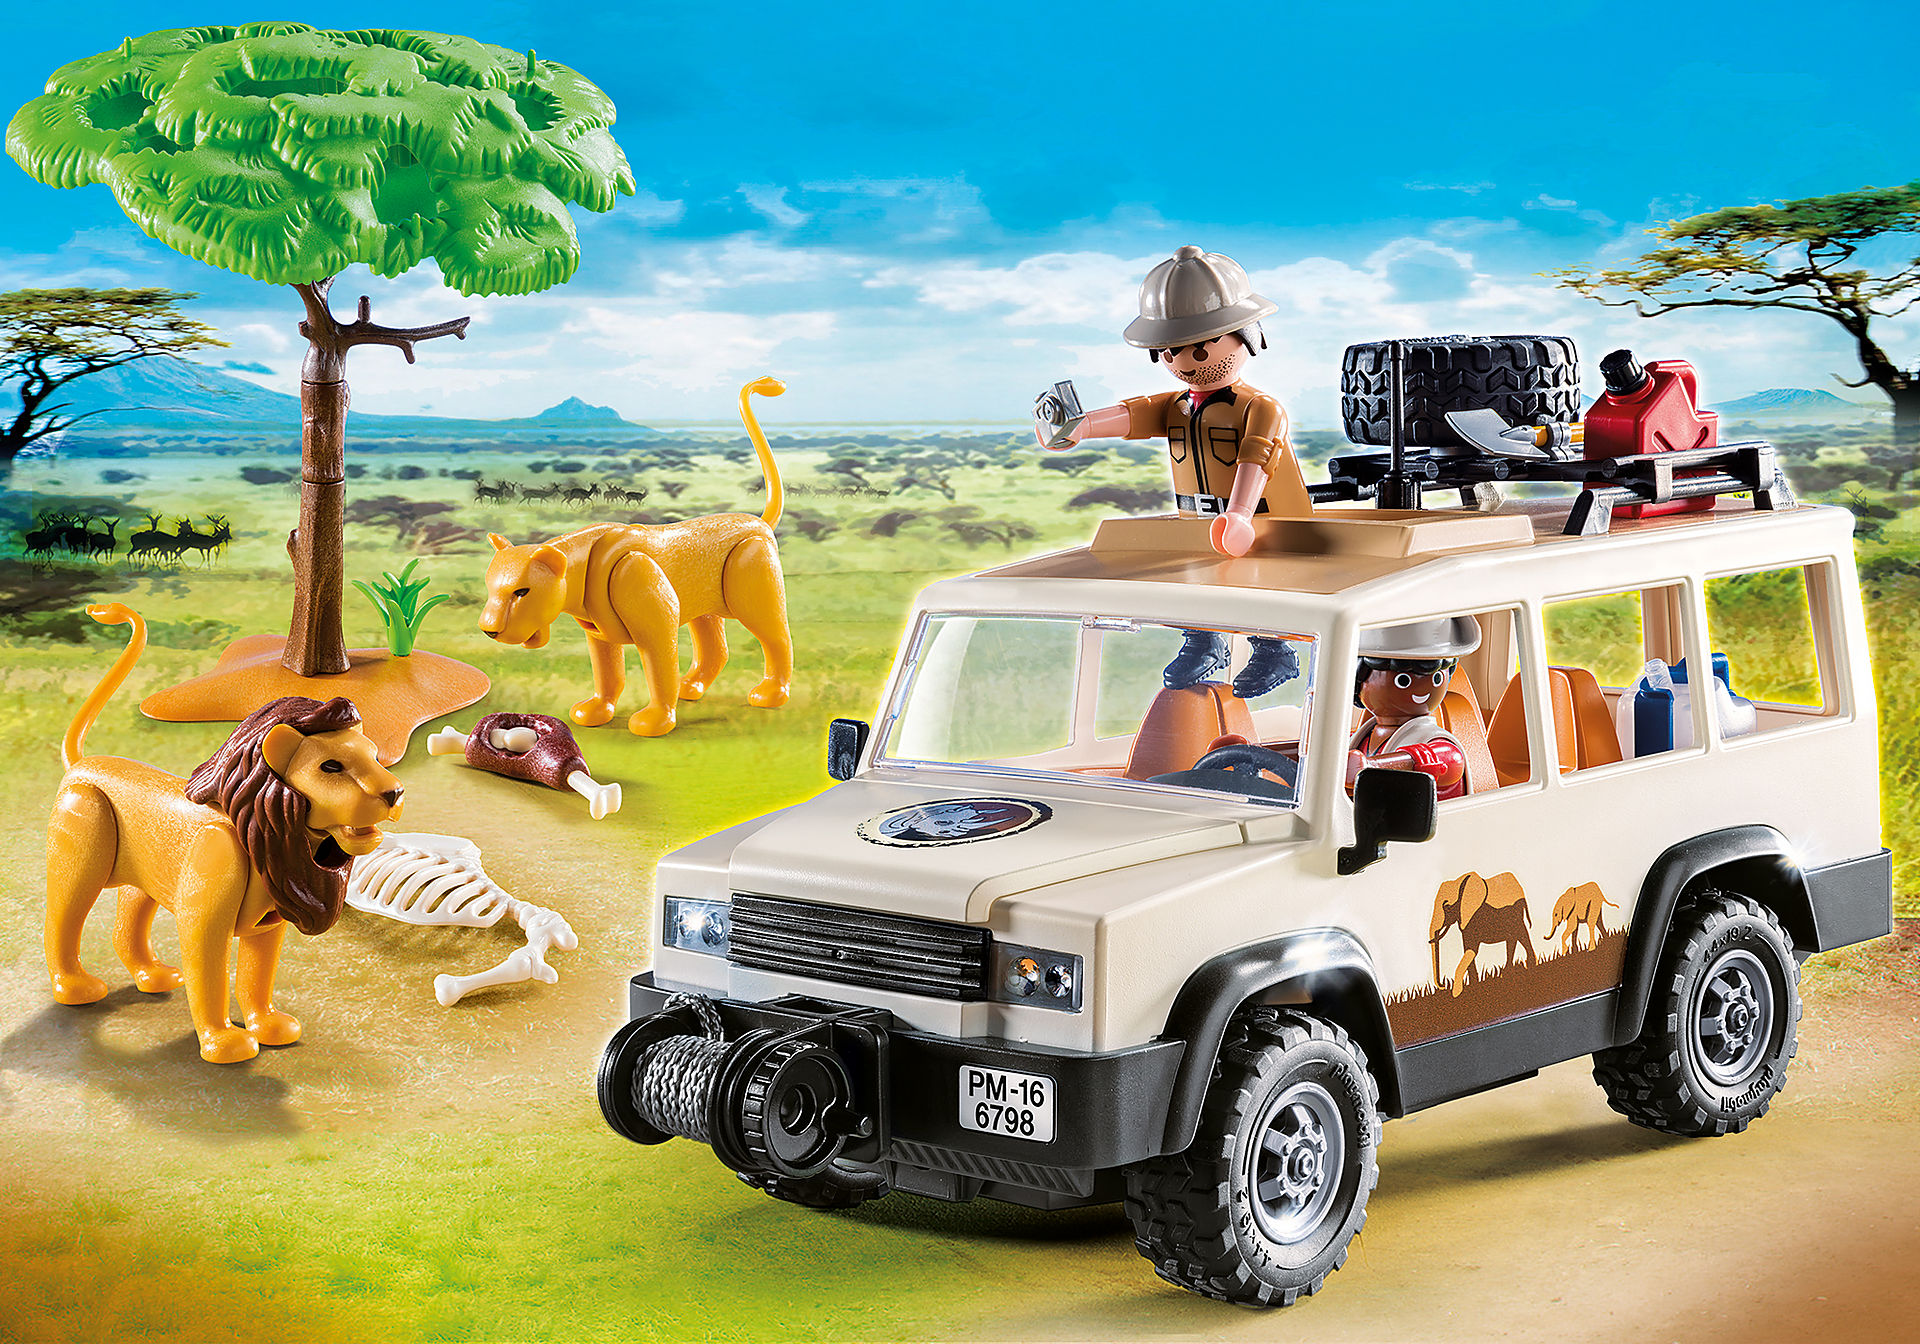 http://media.playmobil.com/i/playmobil/6798_product_detail/Safari-Geländewagen mit Seilwinde